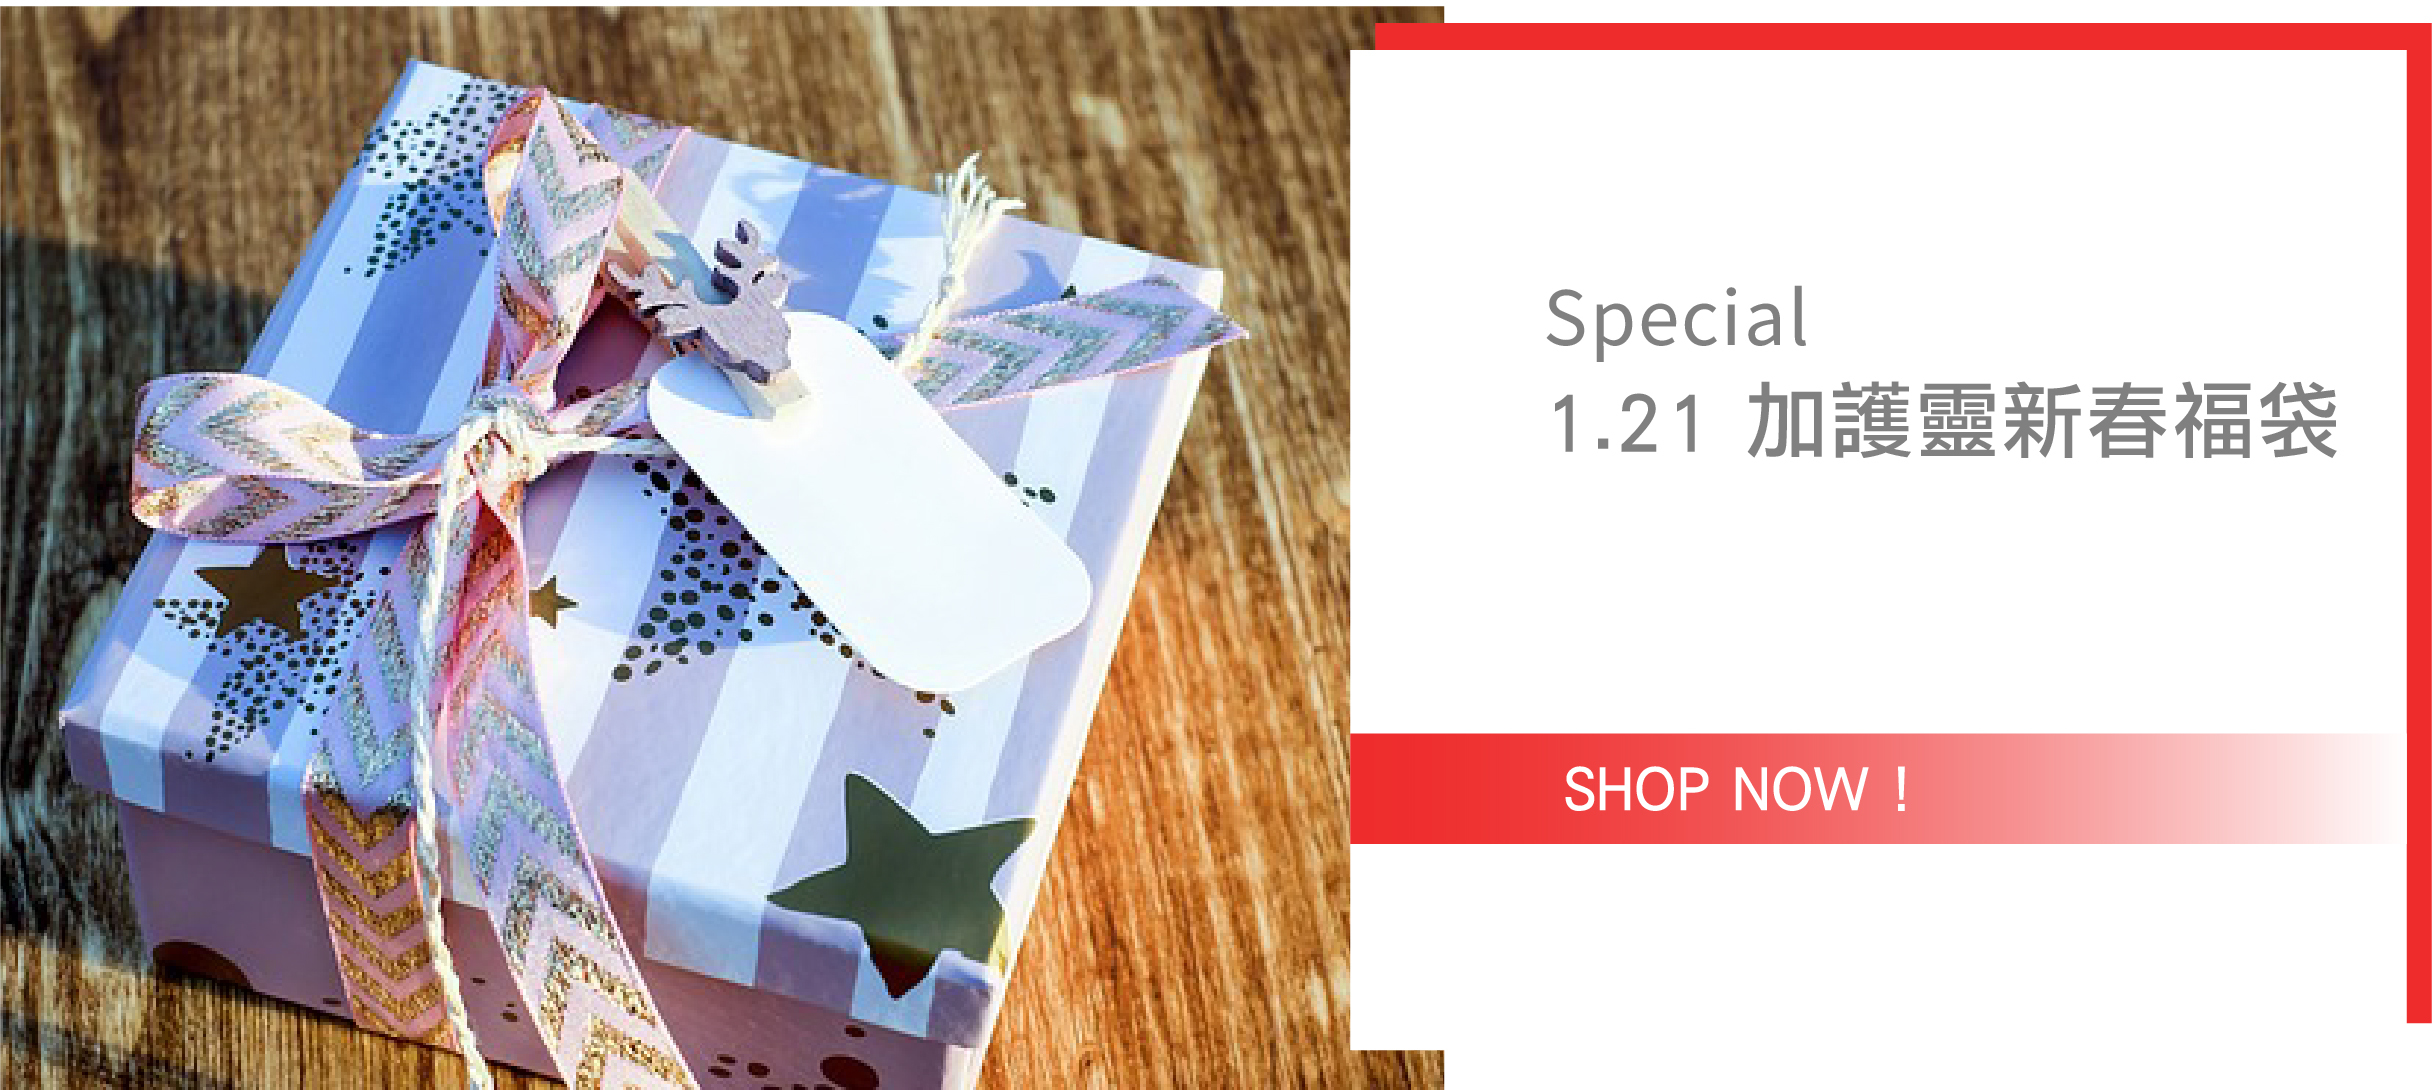 special 0121 加護靈新春福袋